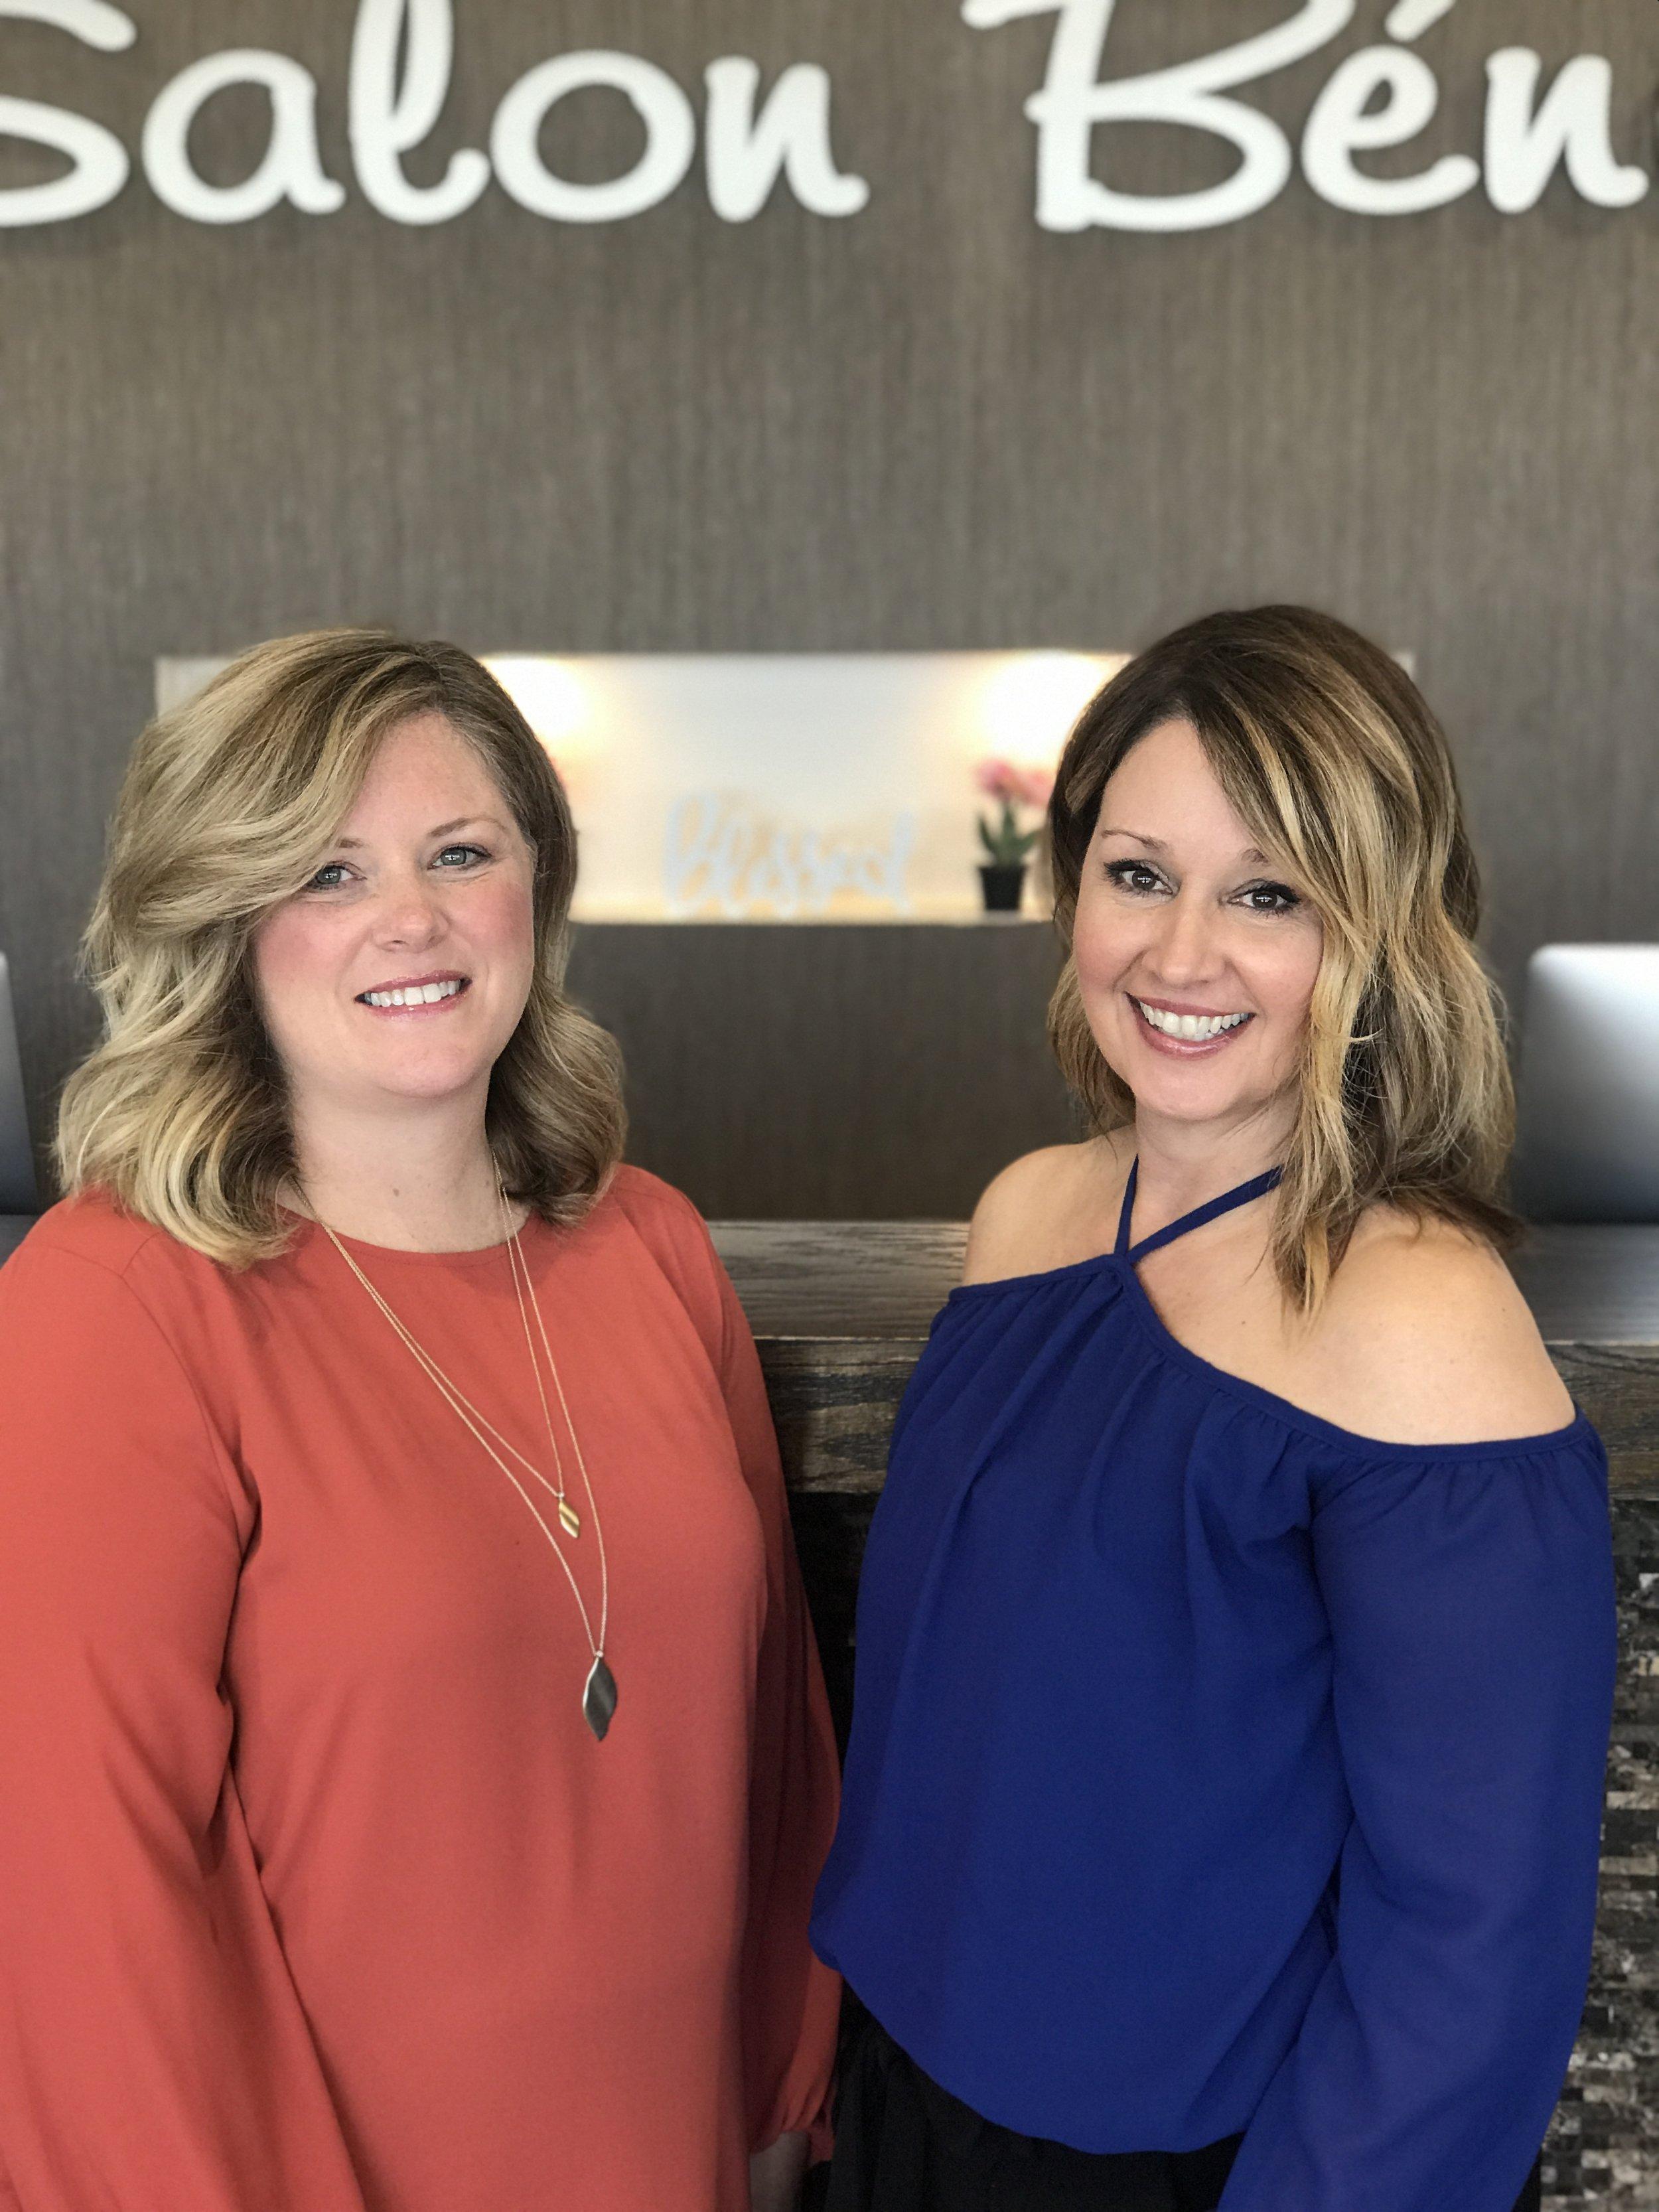 Katie and Terri - Owners of Salon Beni